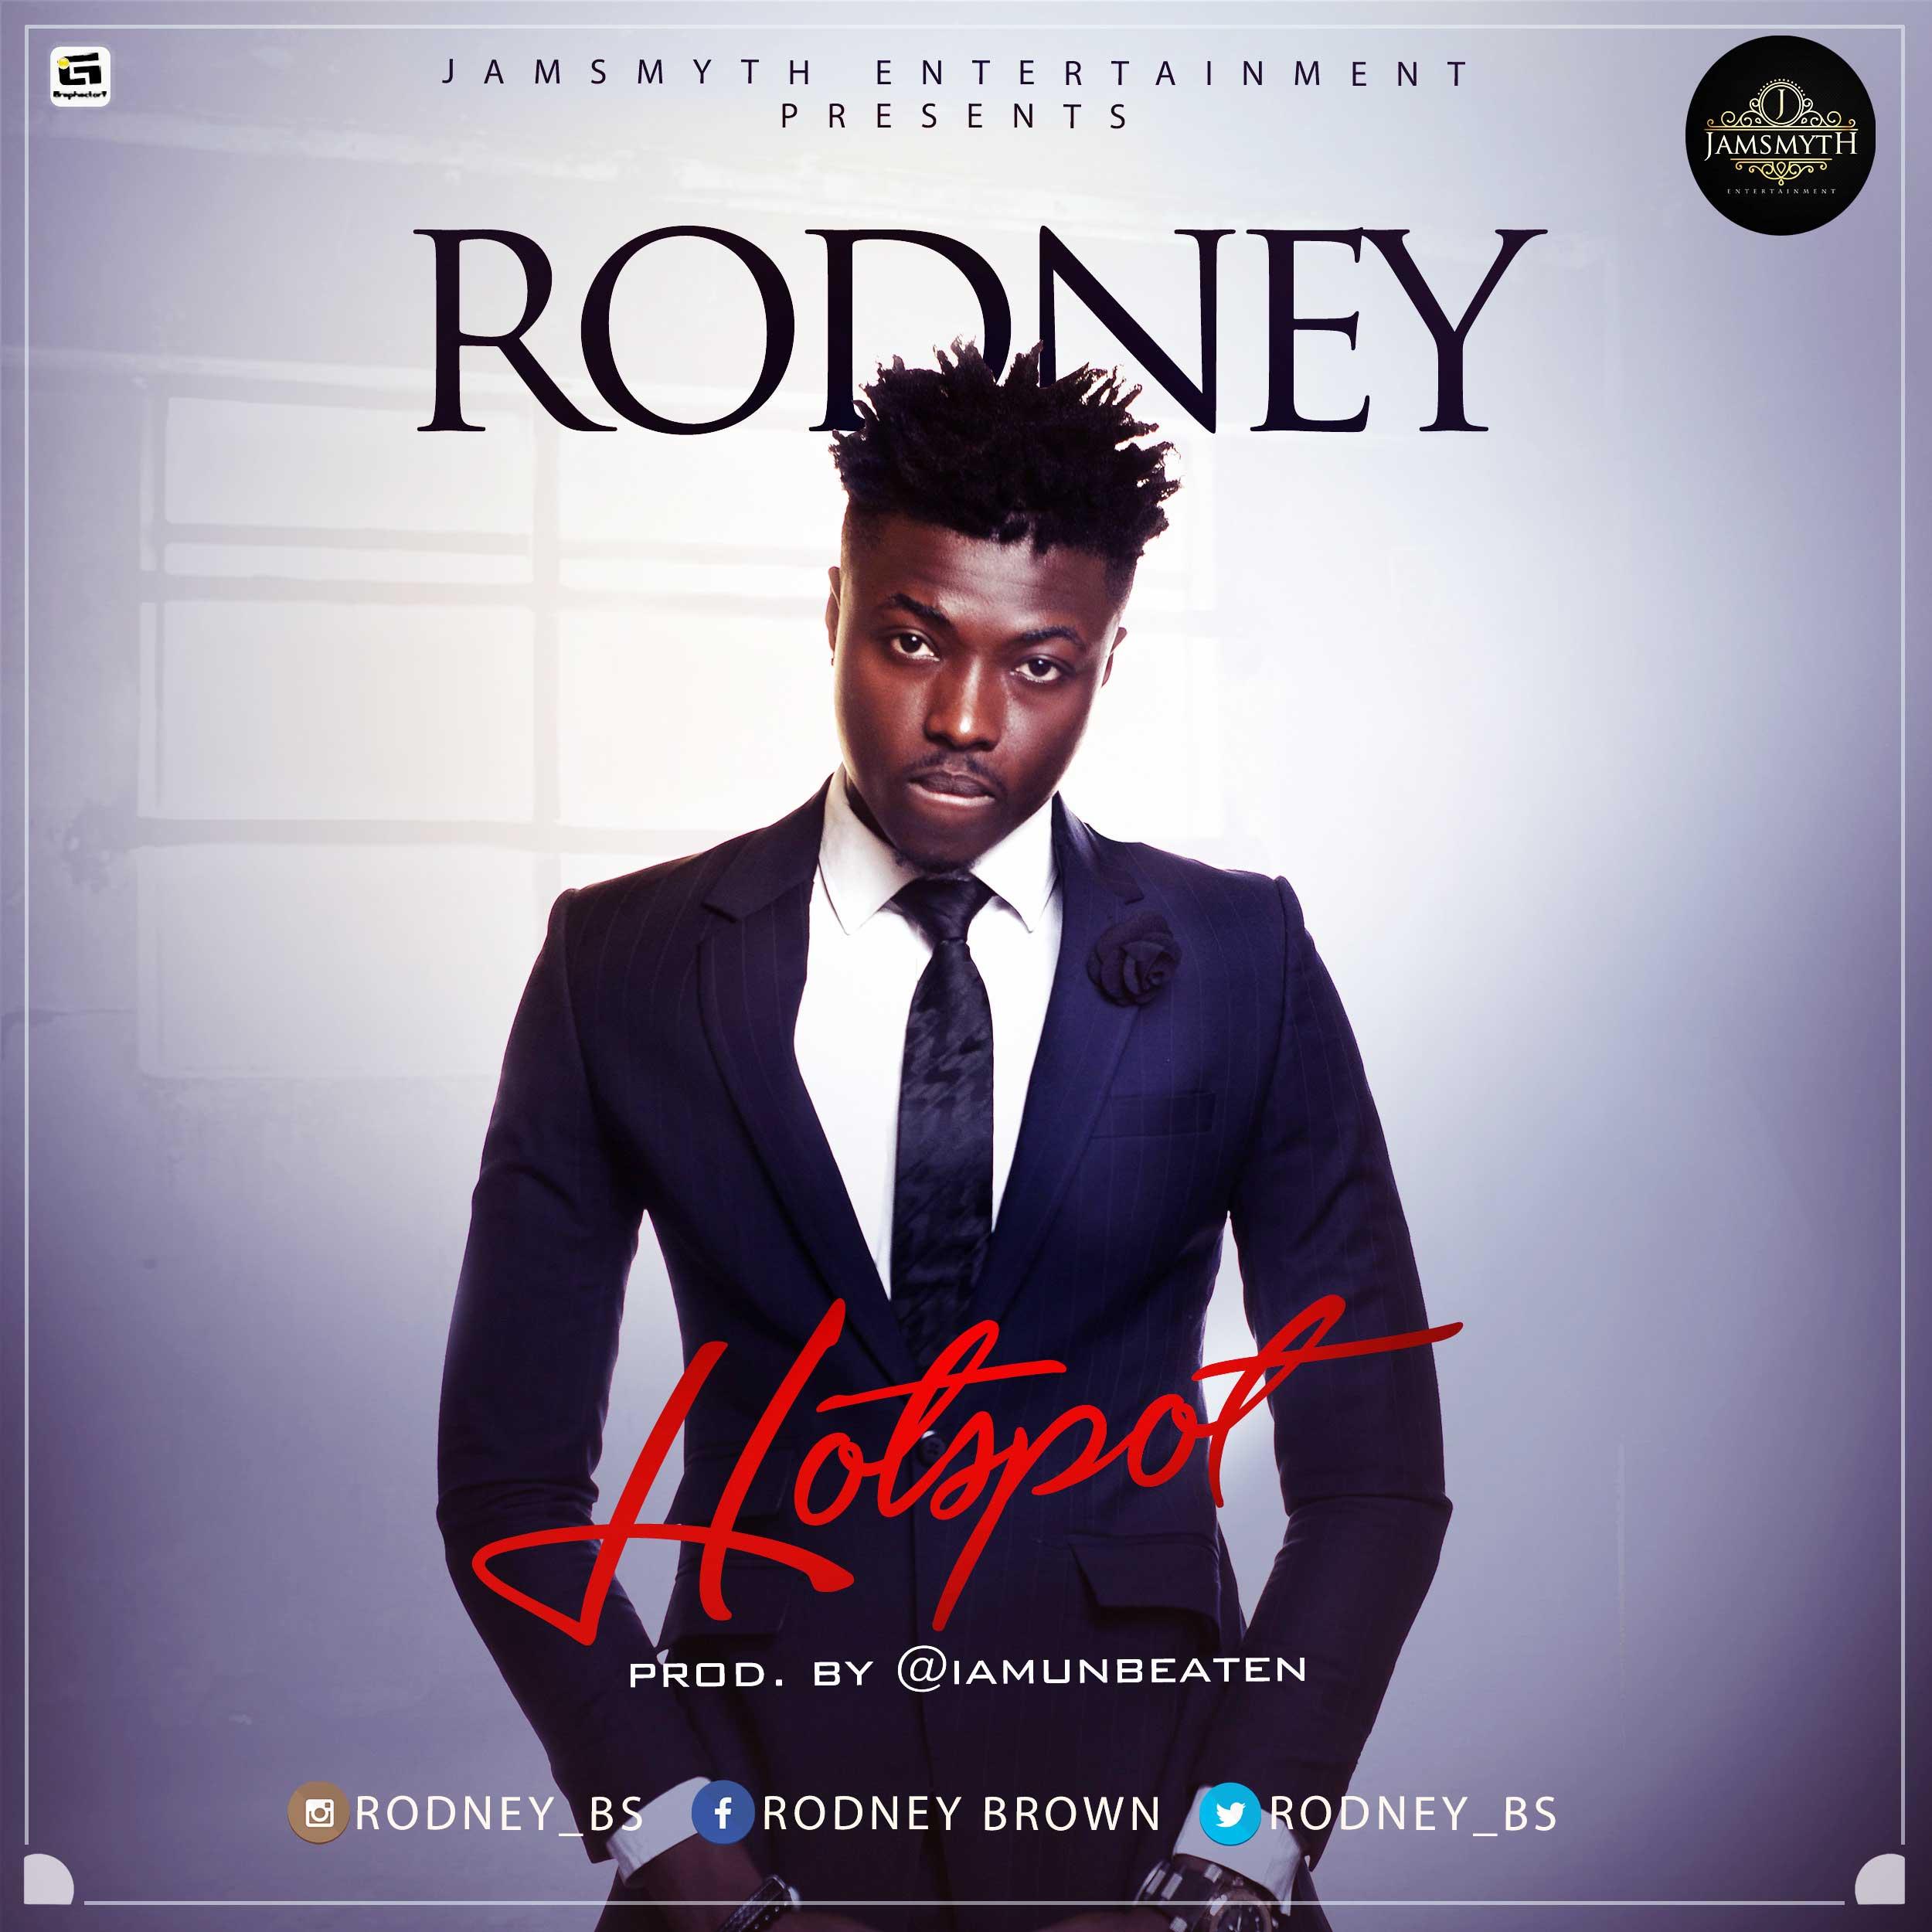 Rodney-Hotspot-[ART]